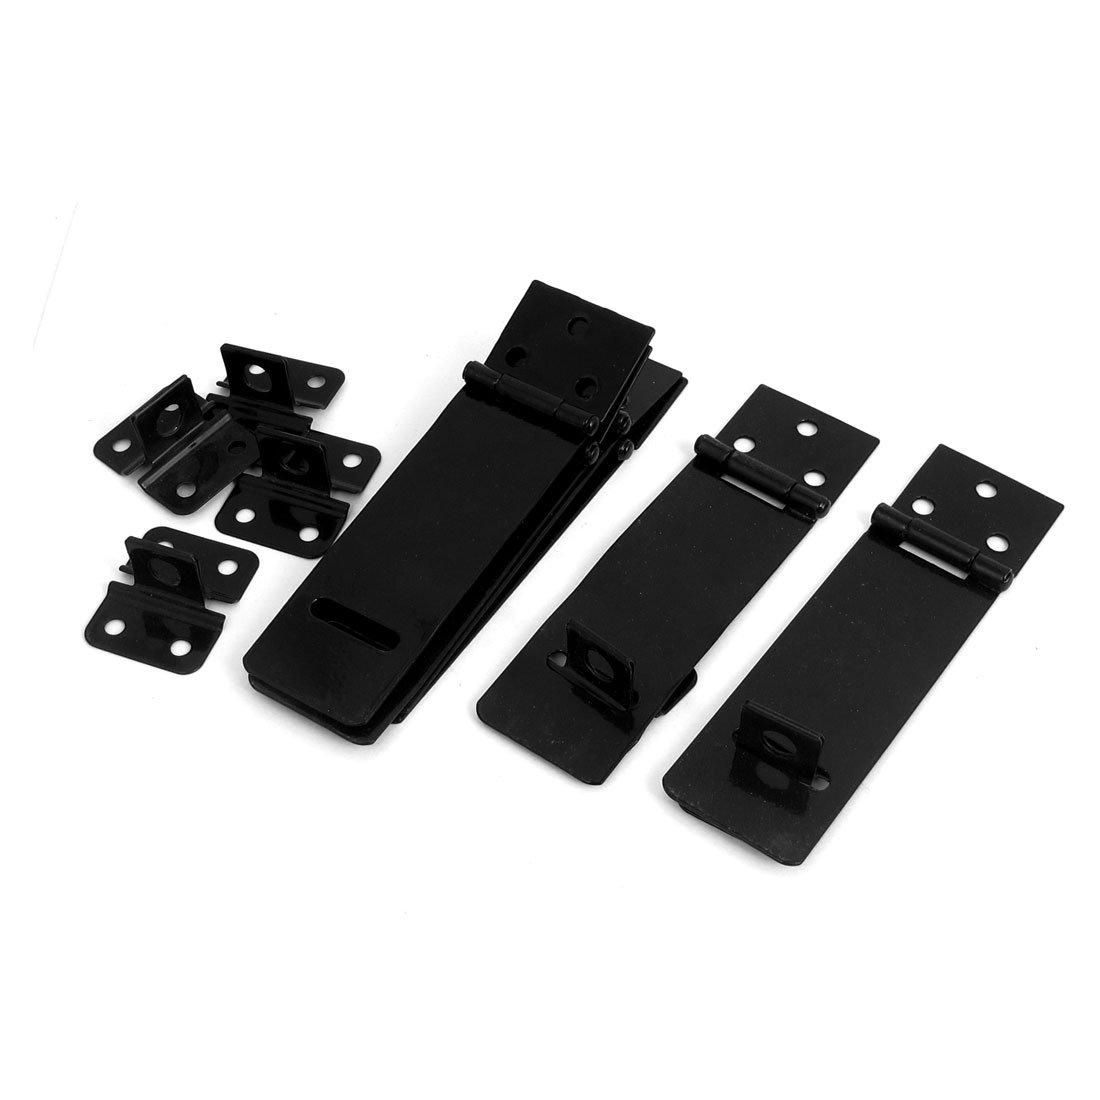 uxcell 6 Set Door Safety Lock Black Metal Padlock Hasp Staple 117mm Long